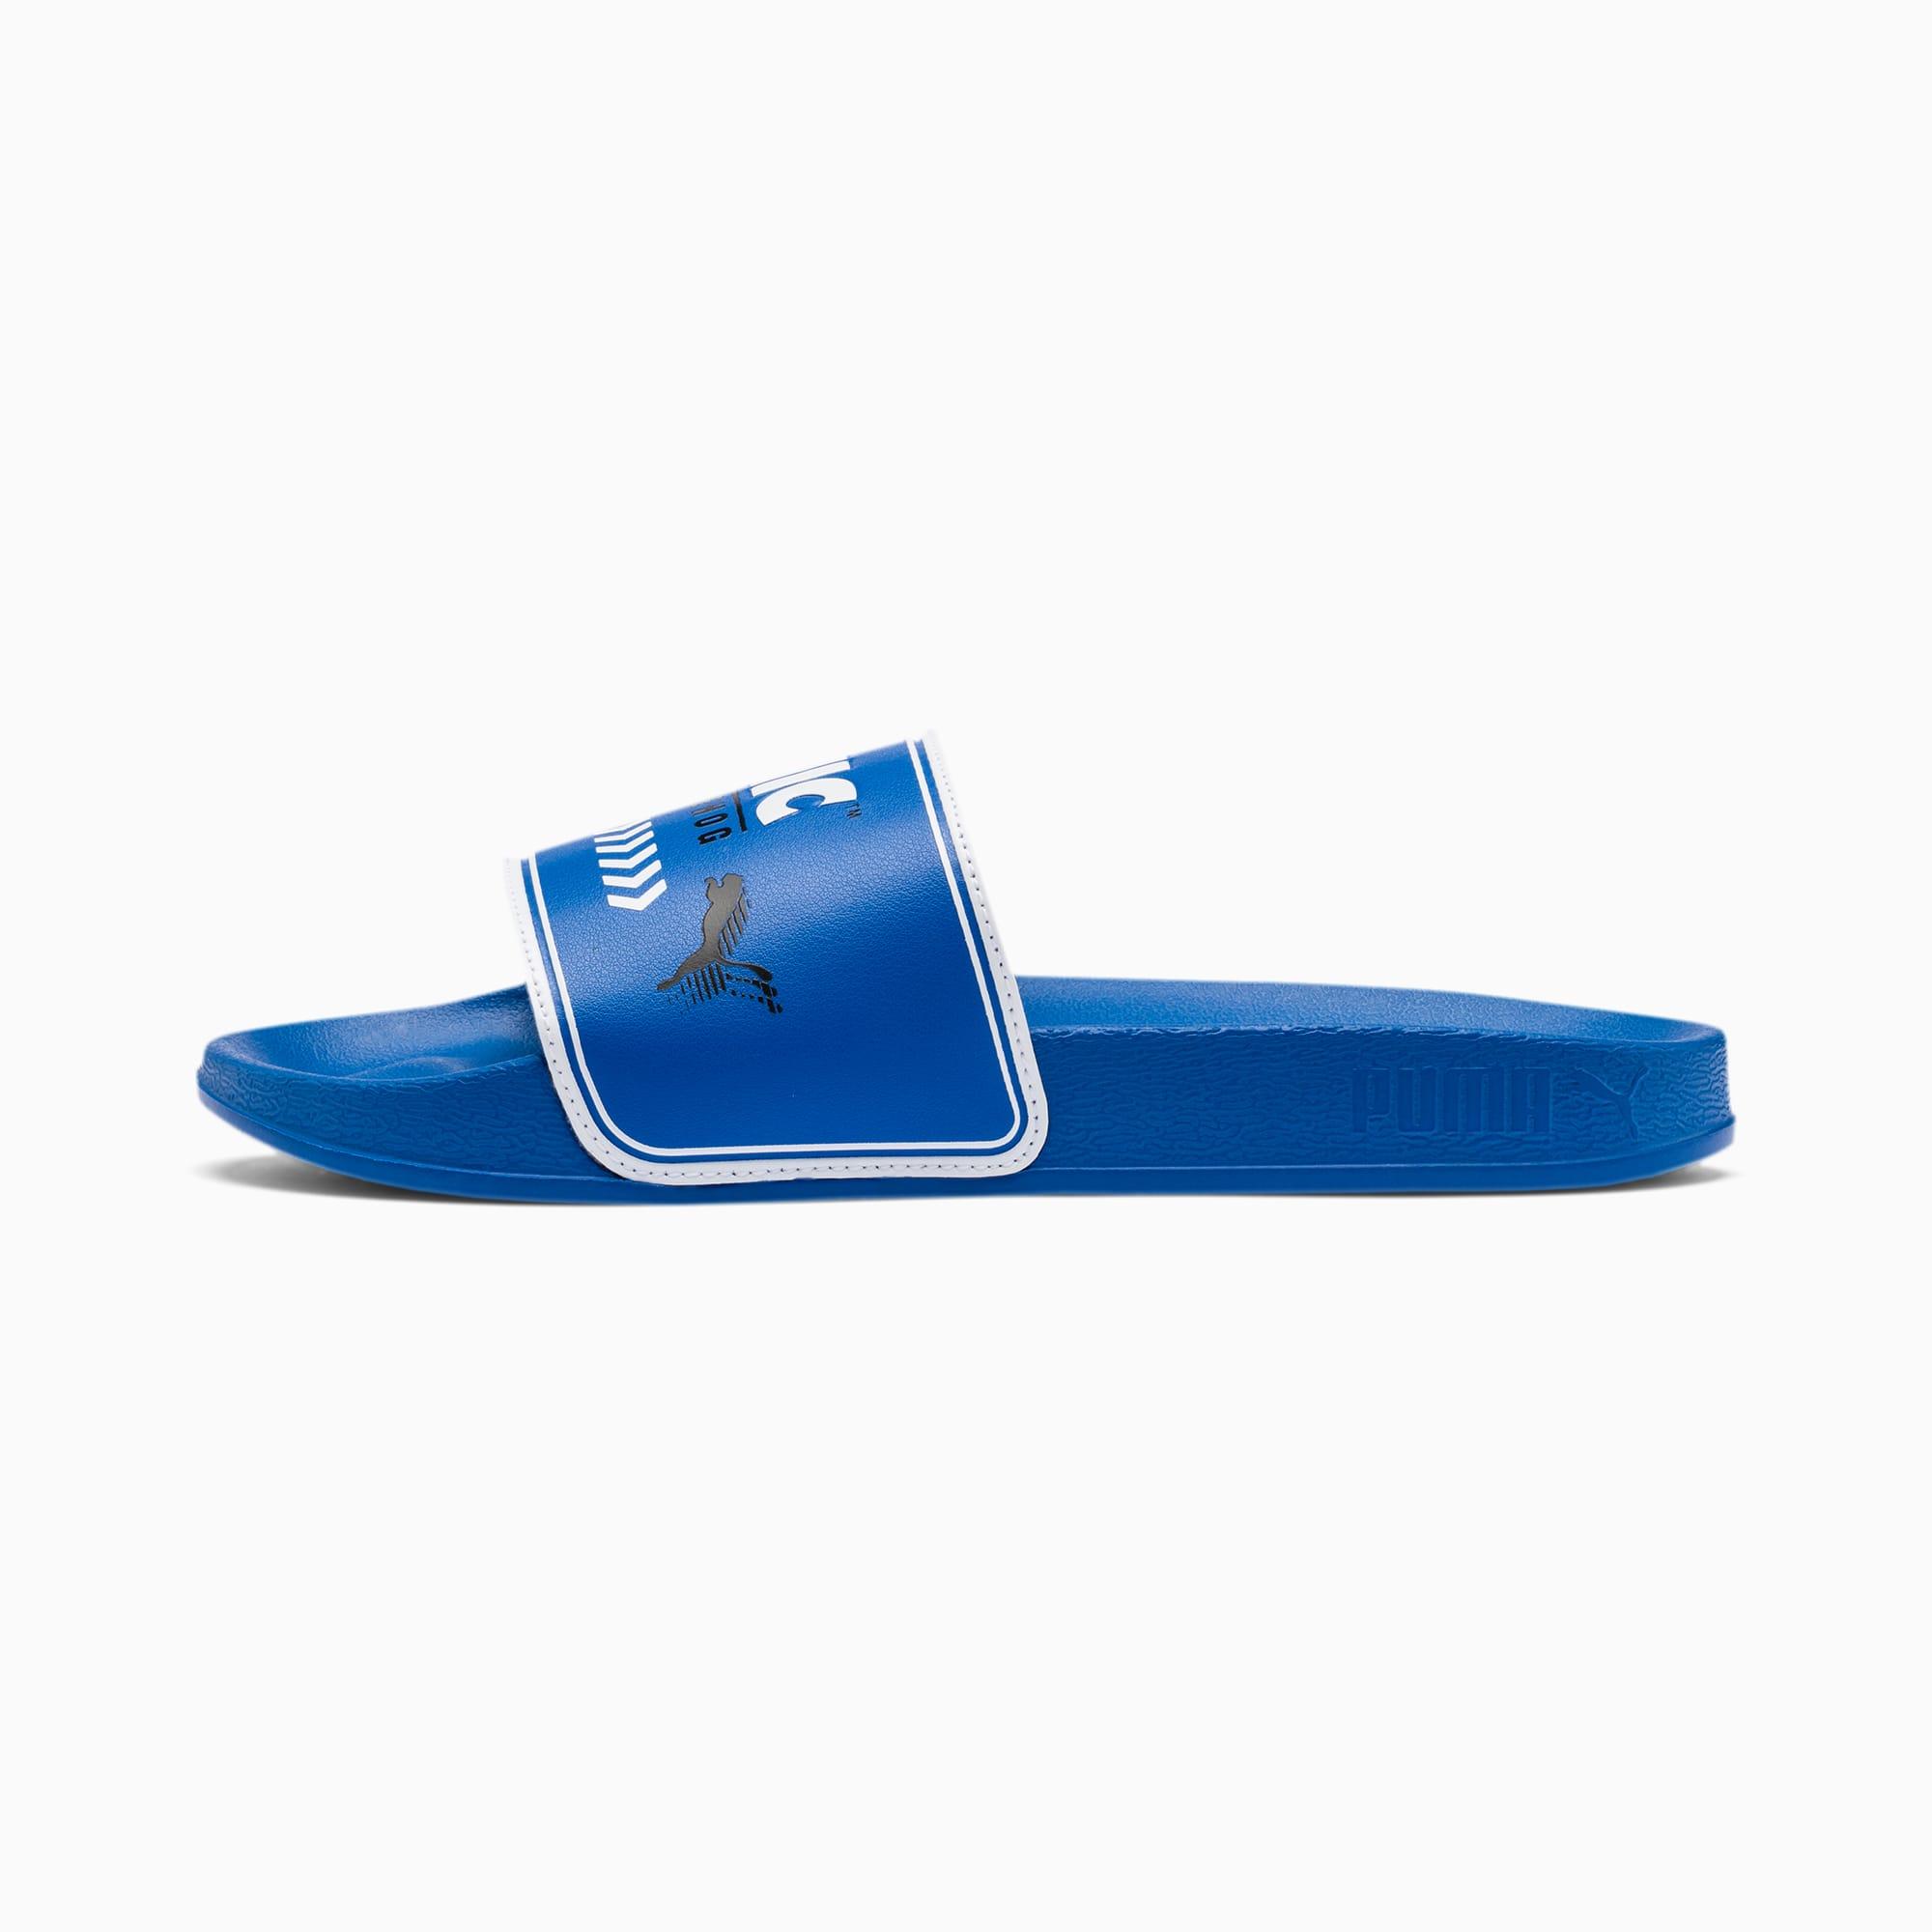 PUMA Sandale PUMA x SONIC Leadcat Youth pour Enfant, Taille 35.5, Chaussures